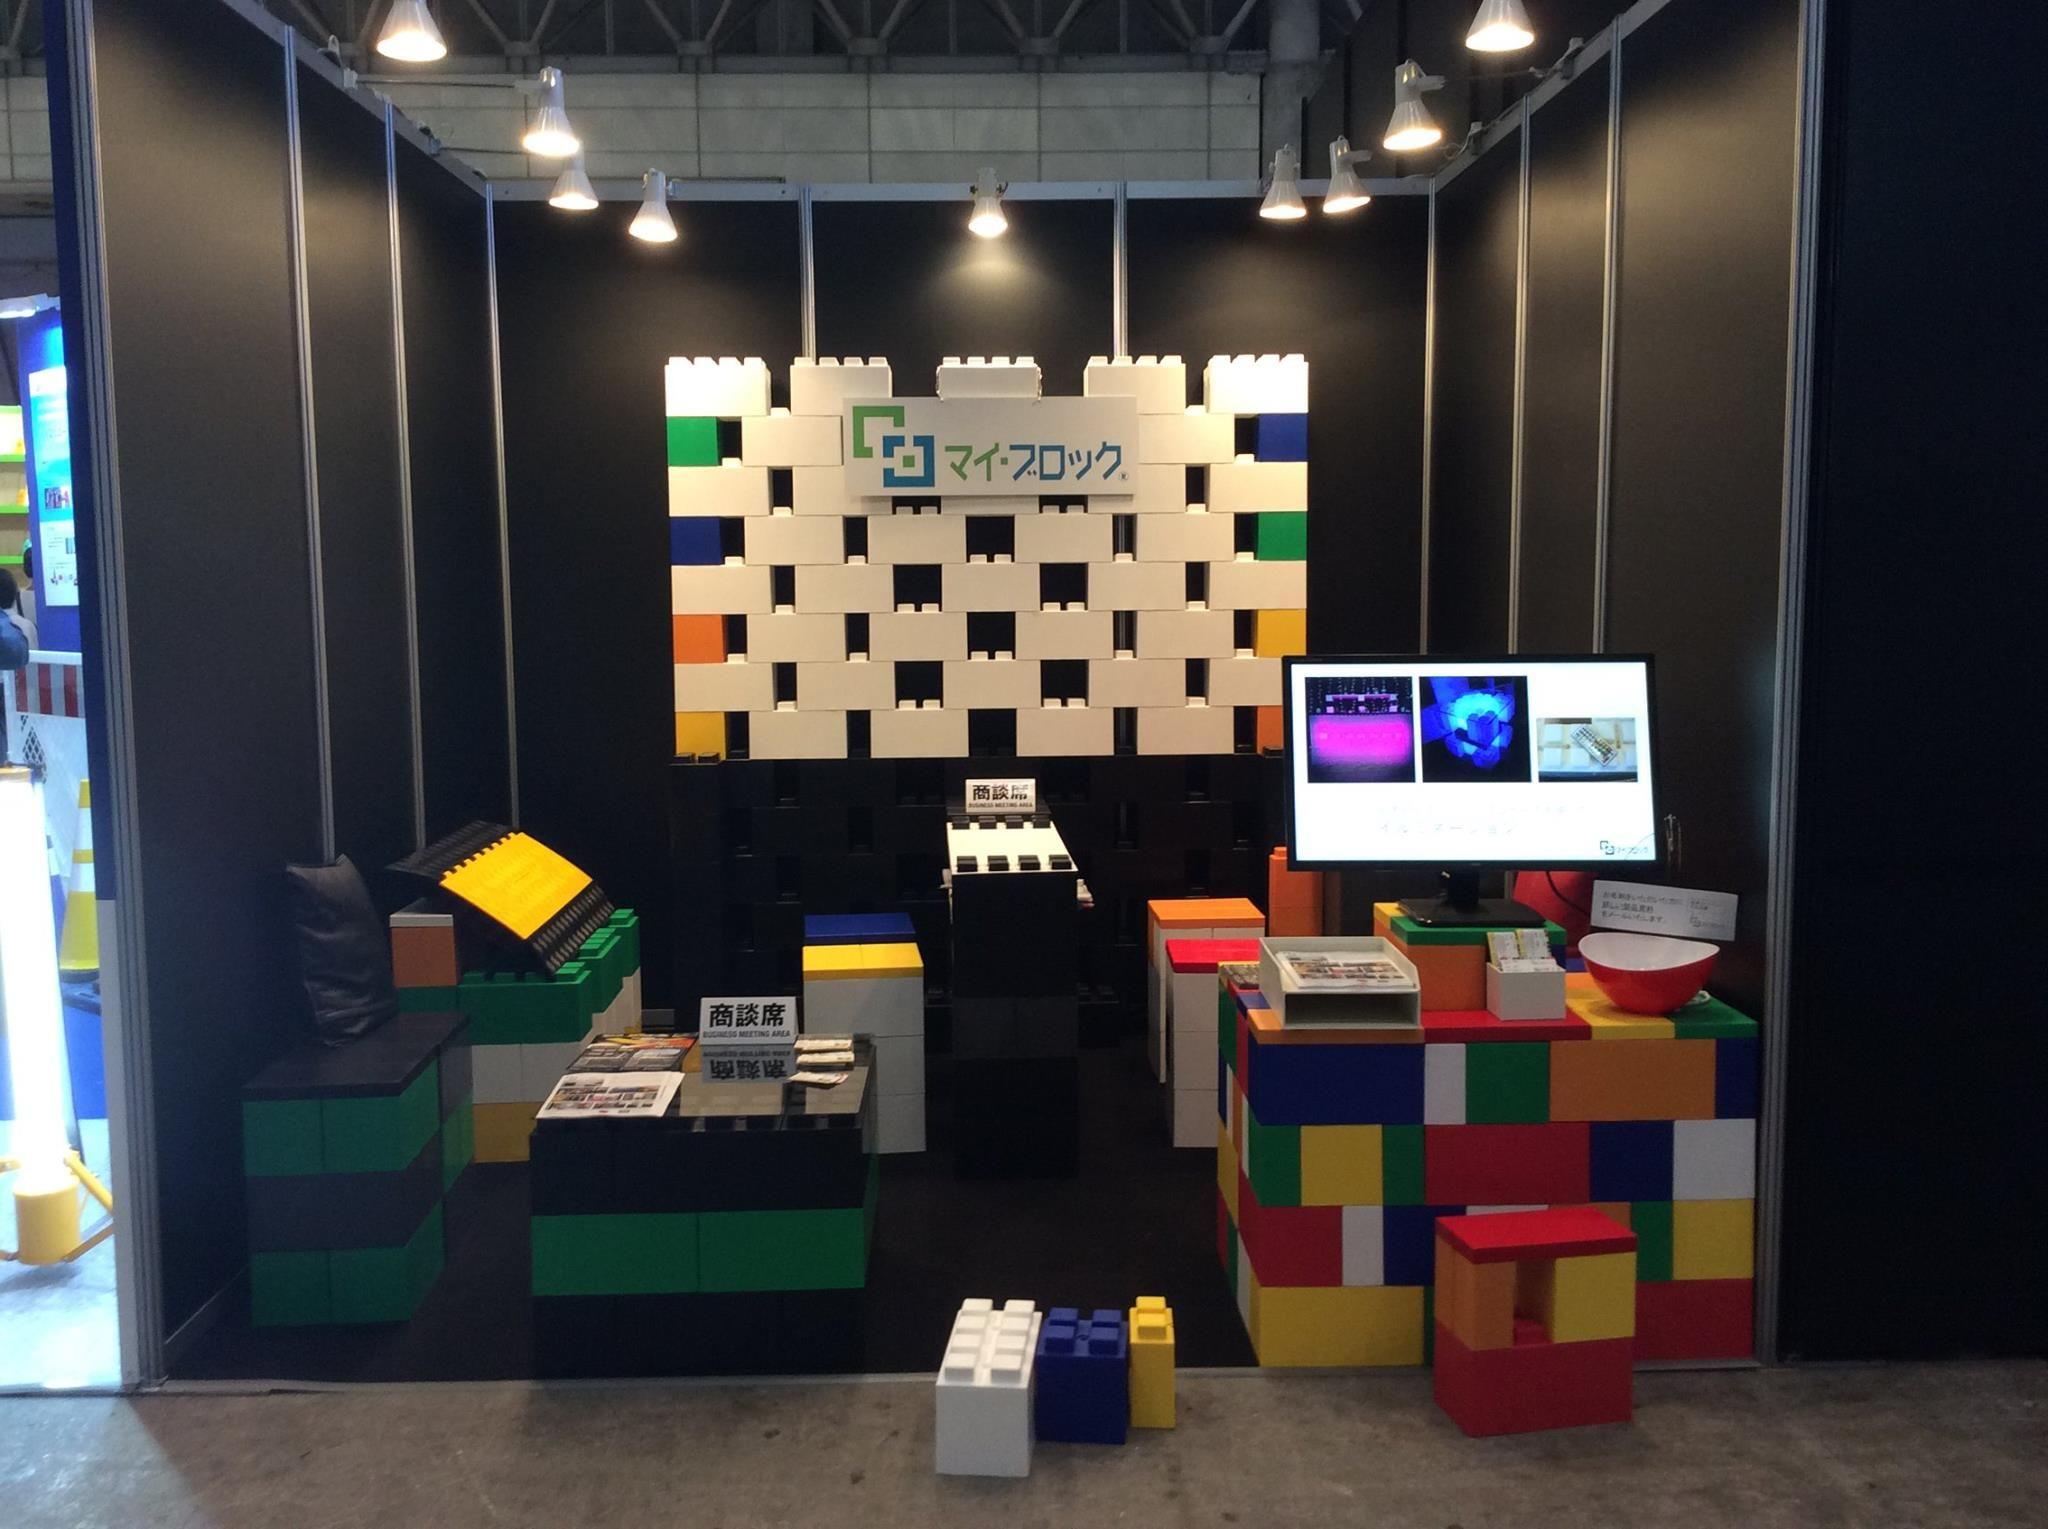 Exhibition Booth Backdrop : Tradeshow expo exhibit display event specialevent